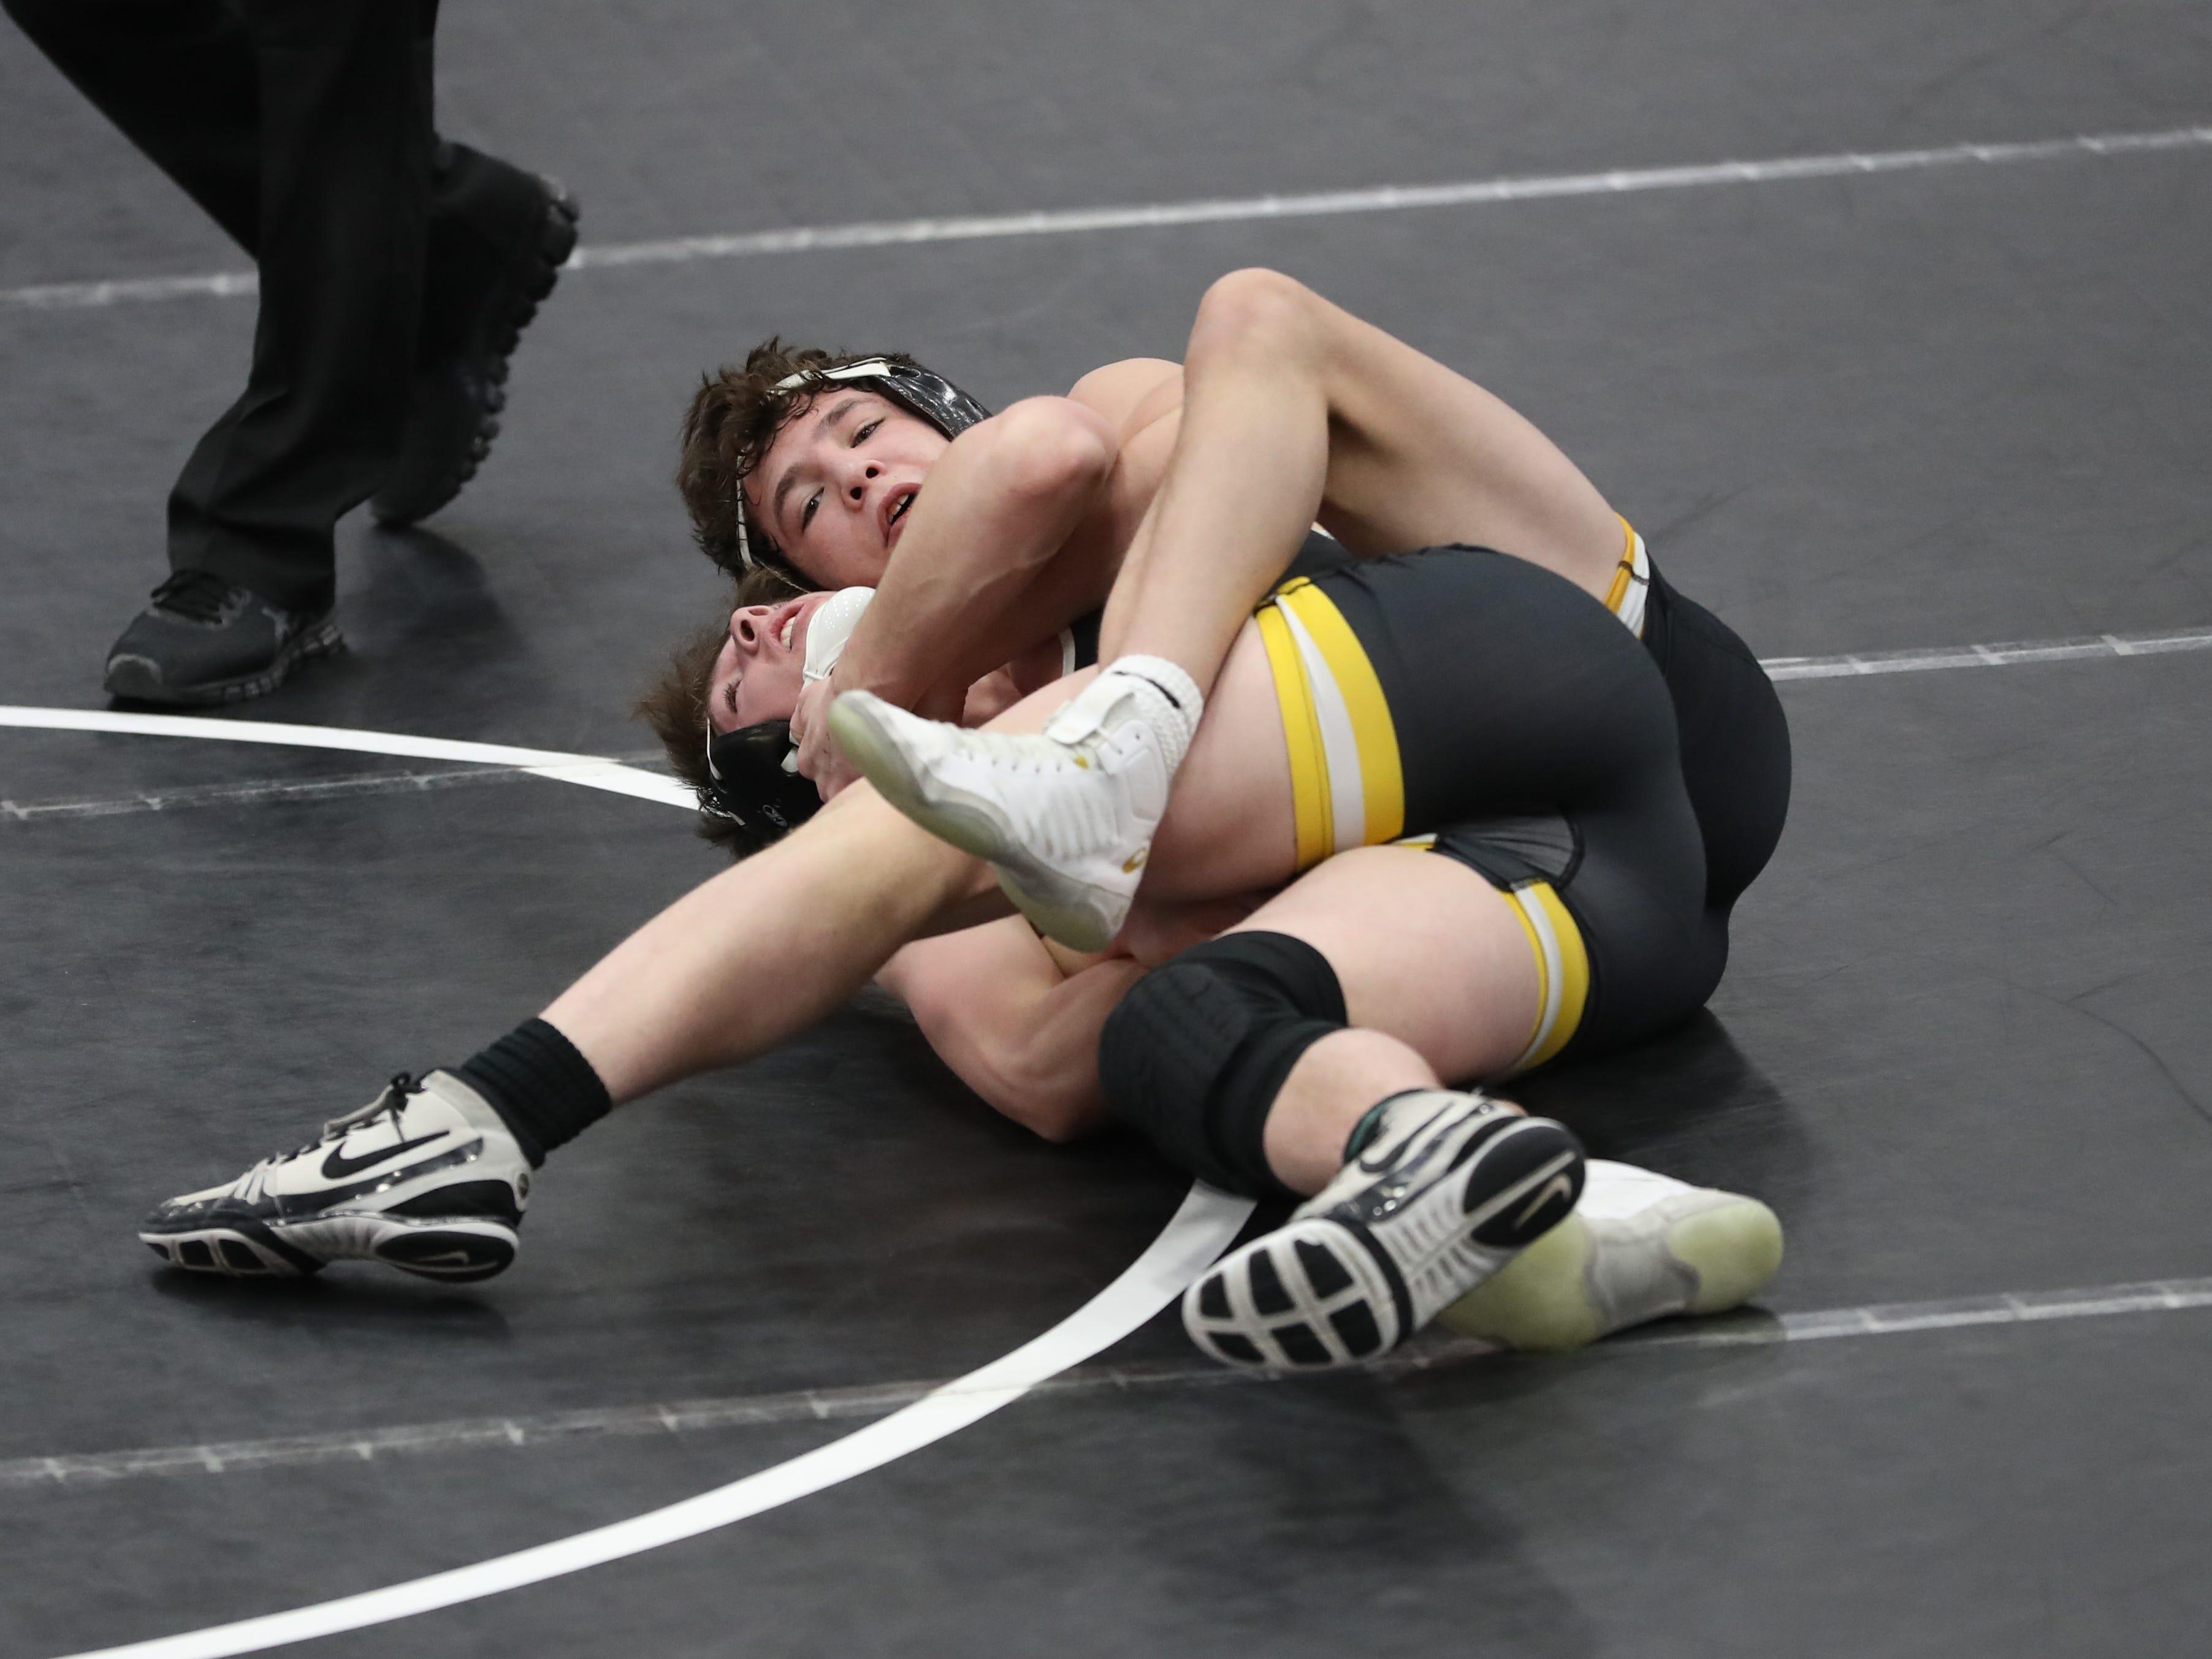 Cade DeVos, of Southeast Polk High, wrestles at the Cheesehead Invitational at Kaukauna High School in Kaukauna, Wisconsin, on Jan. 5, 2019.